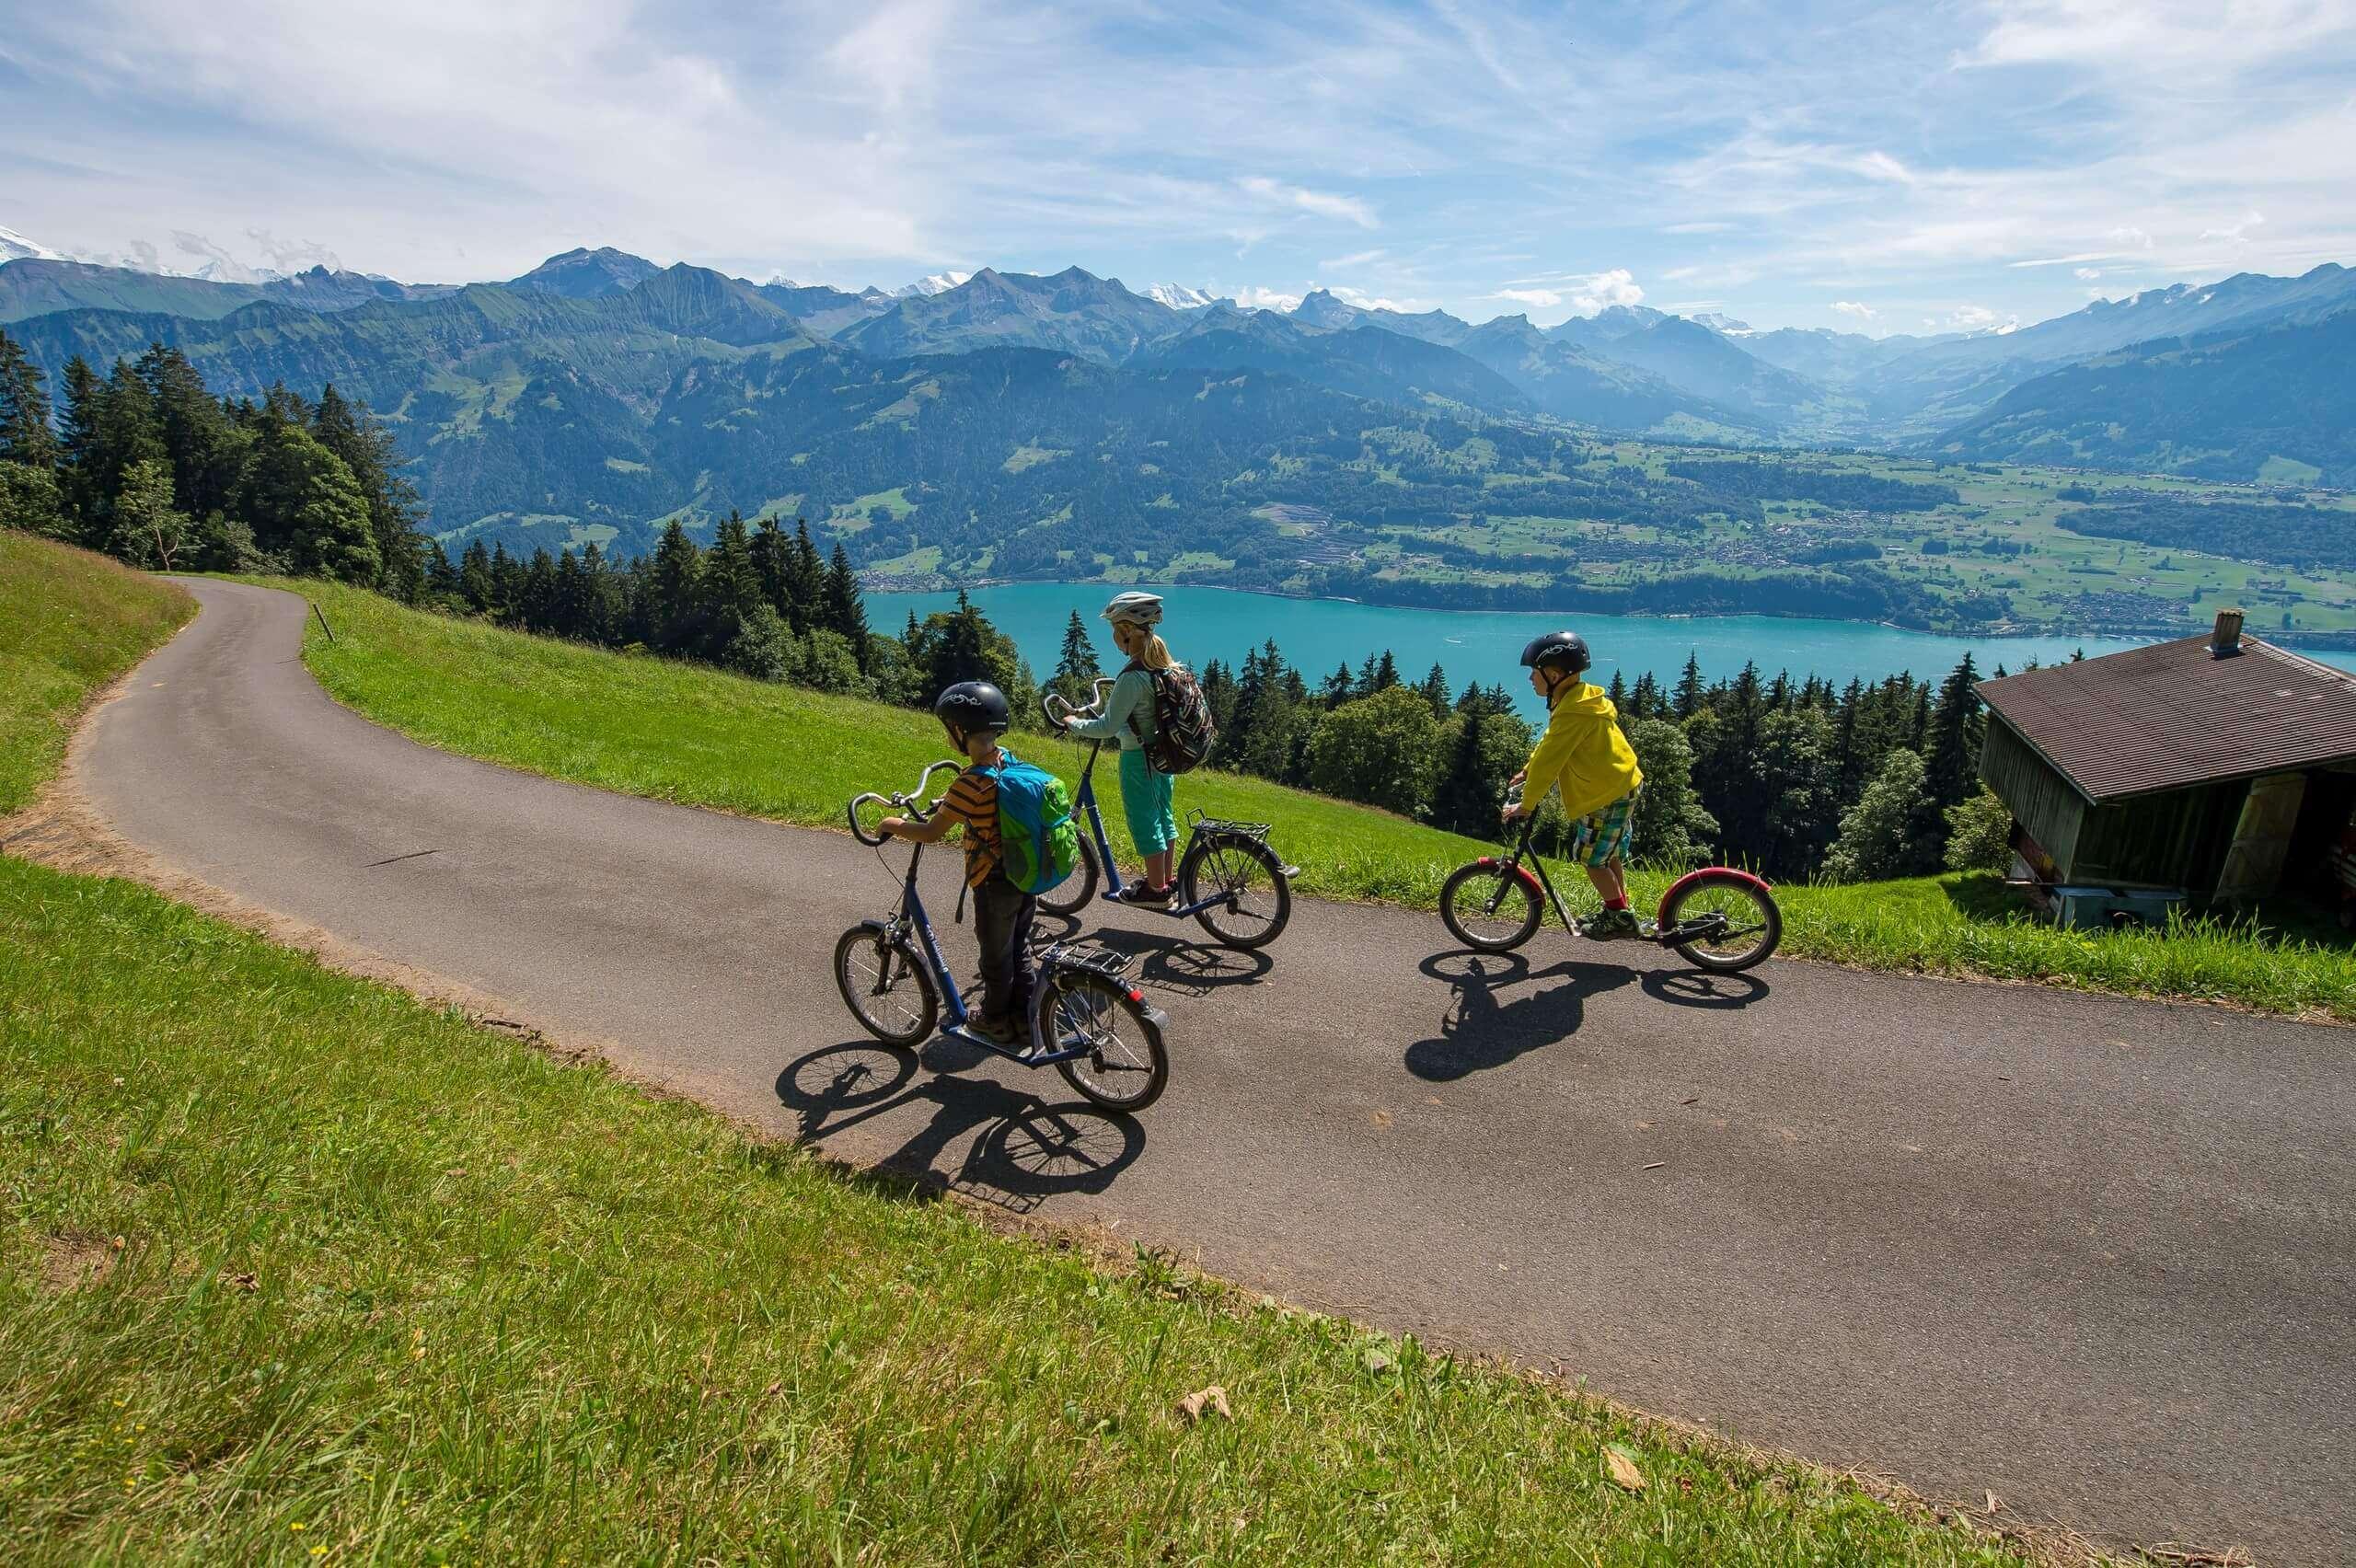 niederhorn-trotti-bike-sommer-abfahrt-gruppe-thunersee-panorama